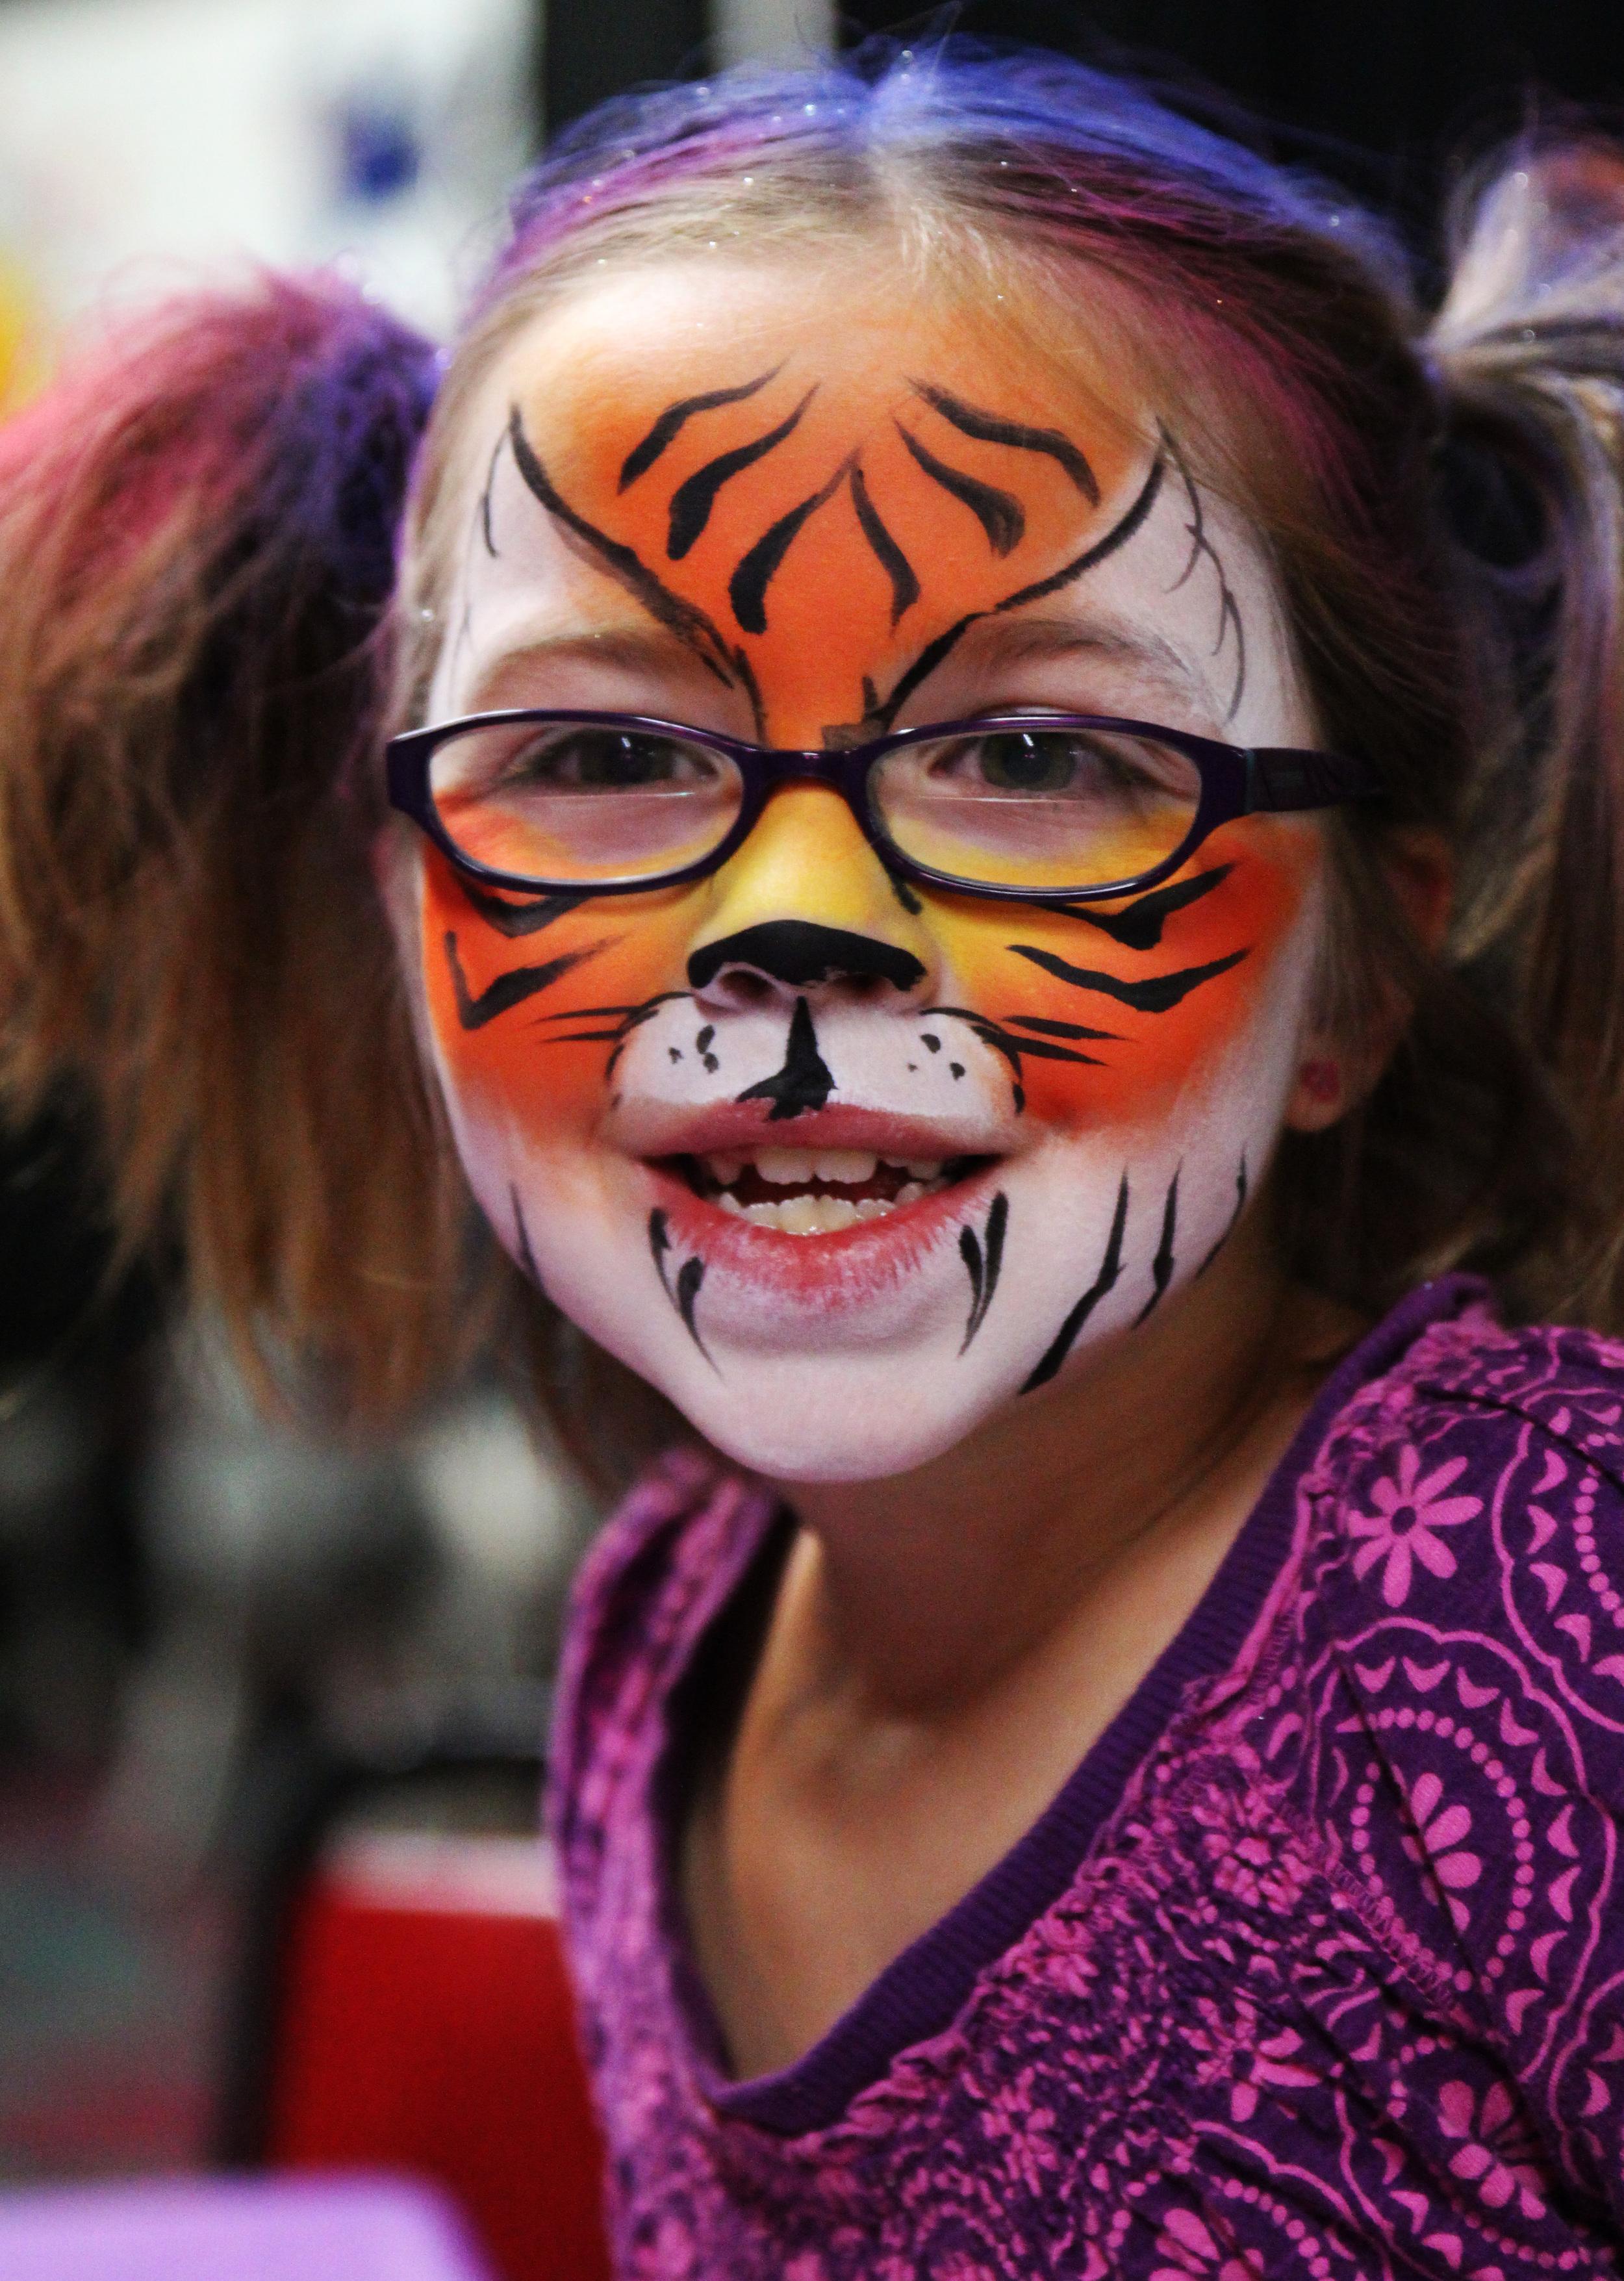 tigress.jpg